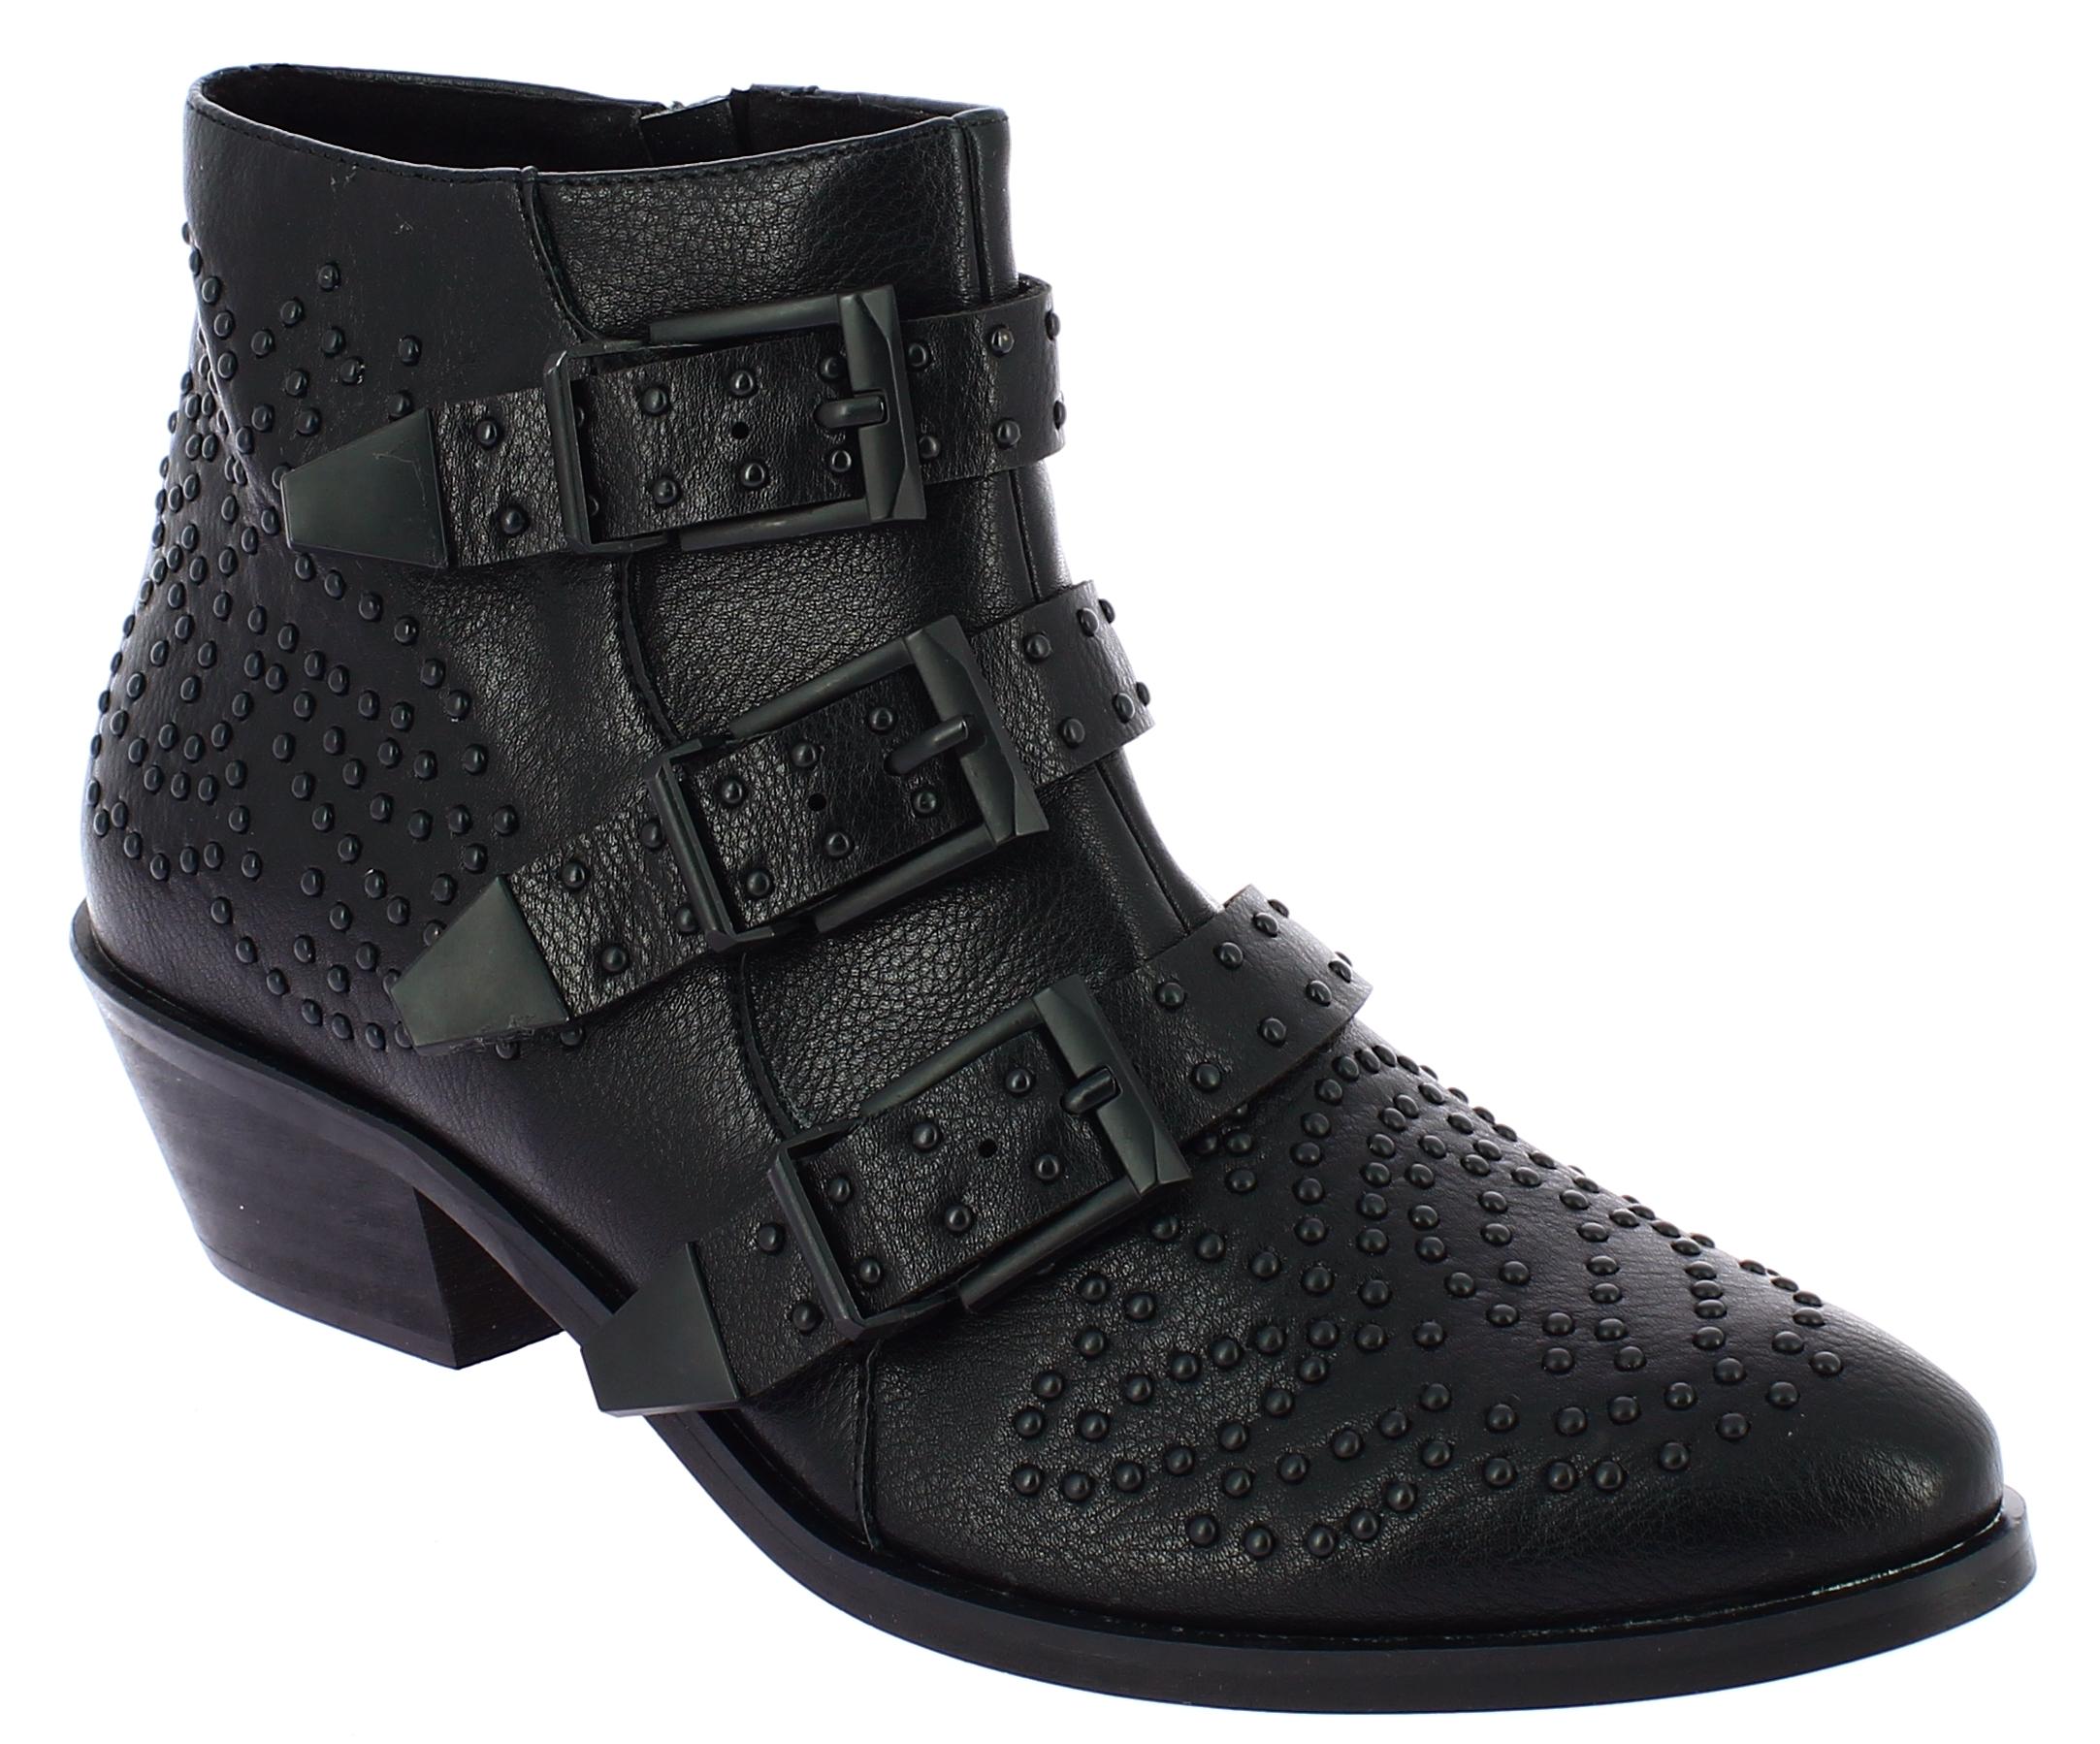 CORINA Γυναικείο Μποτάκι 107.8741 Μαύρο - Μαύρο - 8741 BLACK-CORINA-black-36/4/1/81